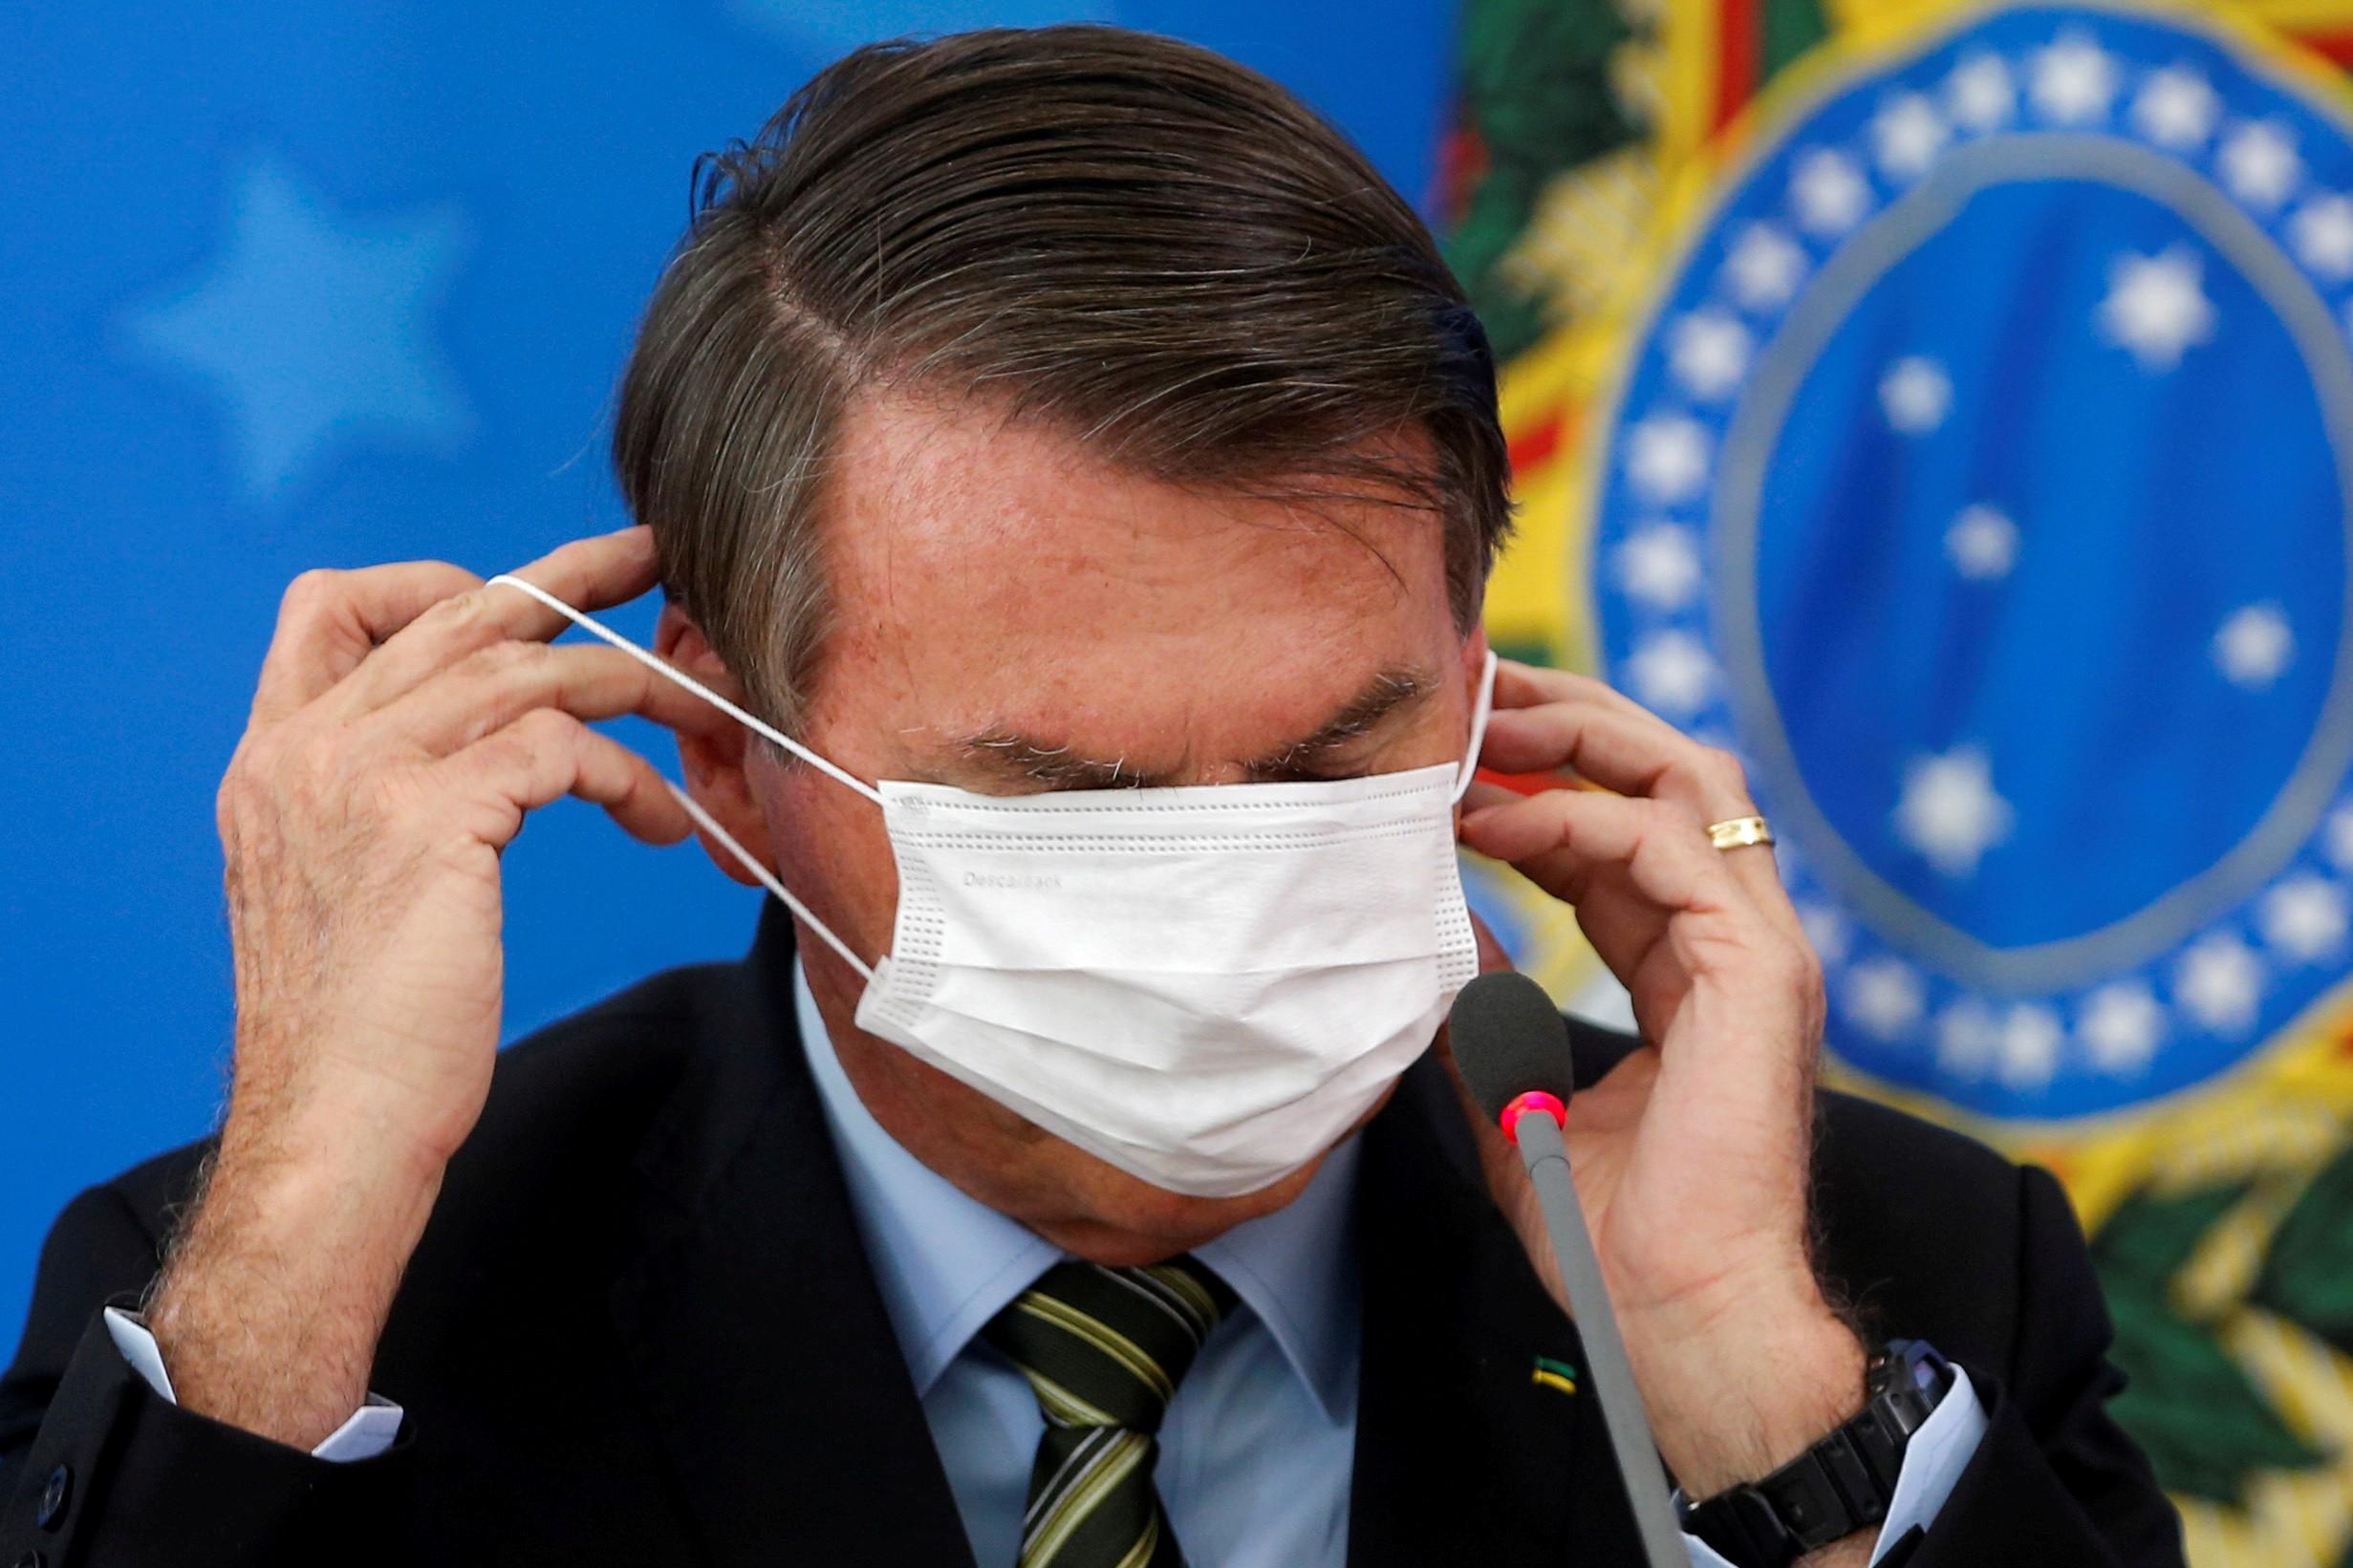 Bolsonaro se atrapalha com máscara em entrevista sobre o coronavírus